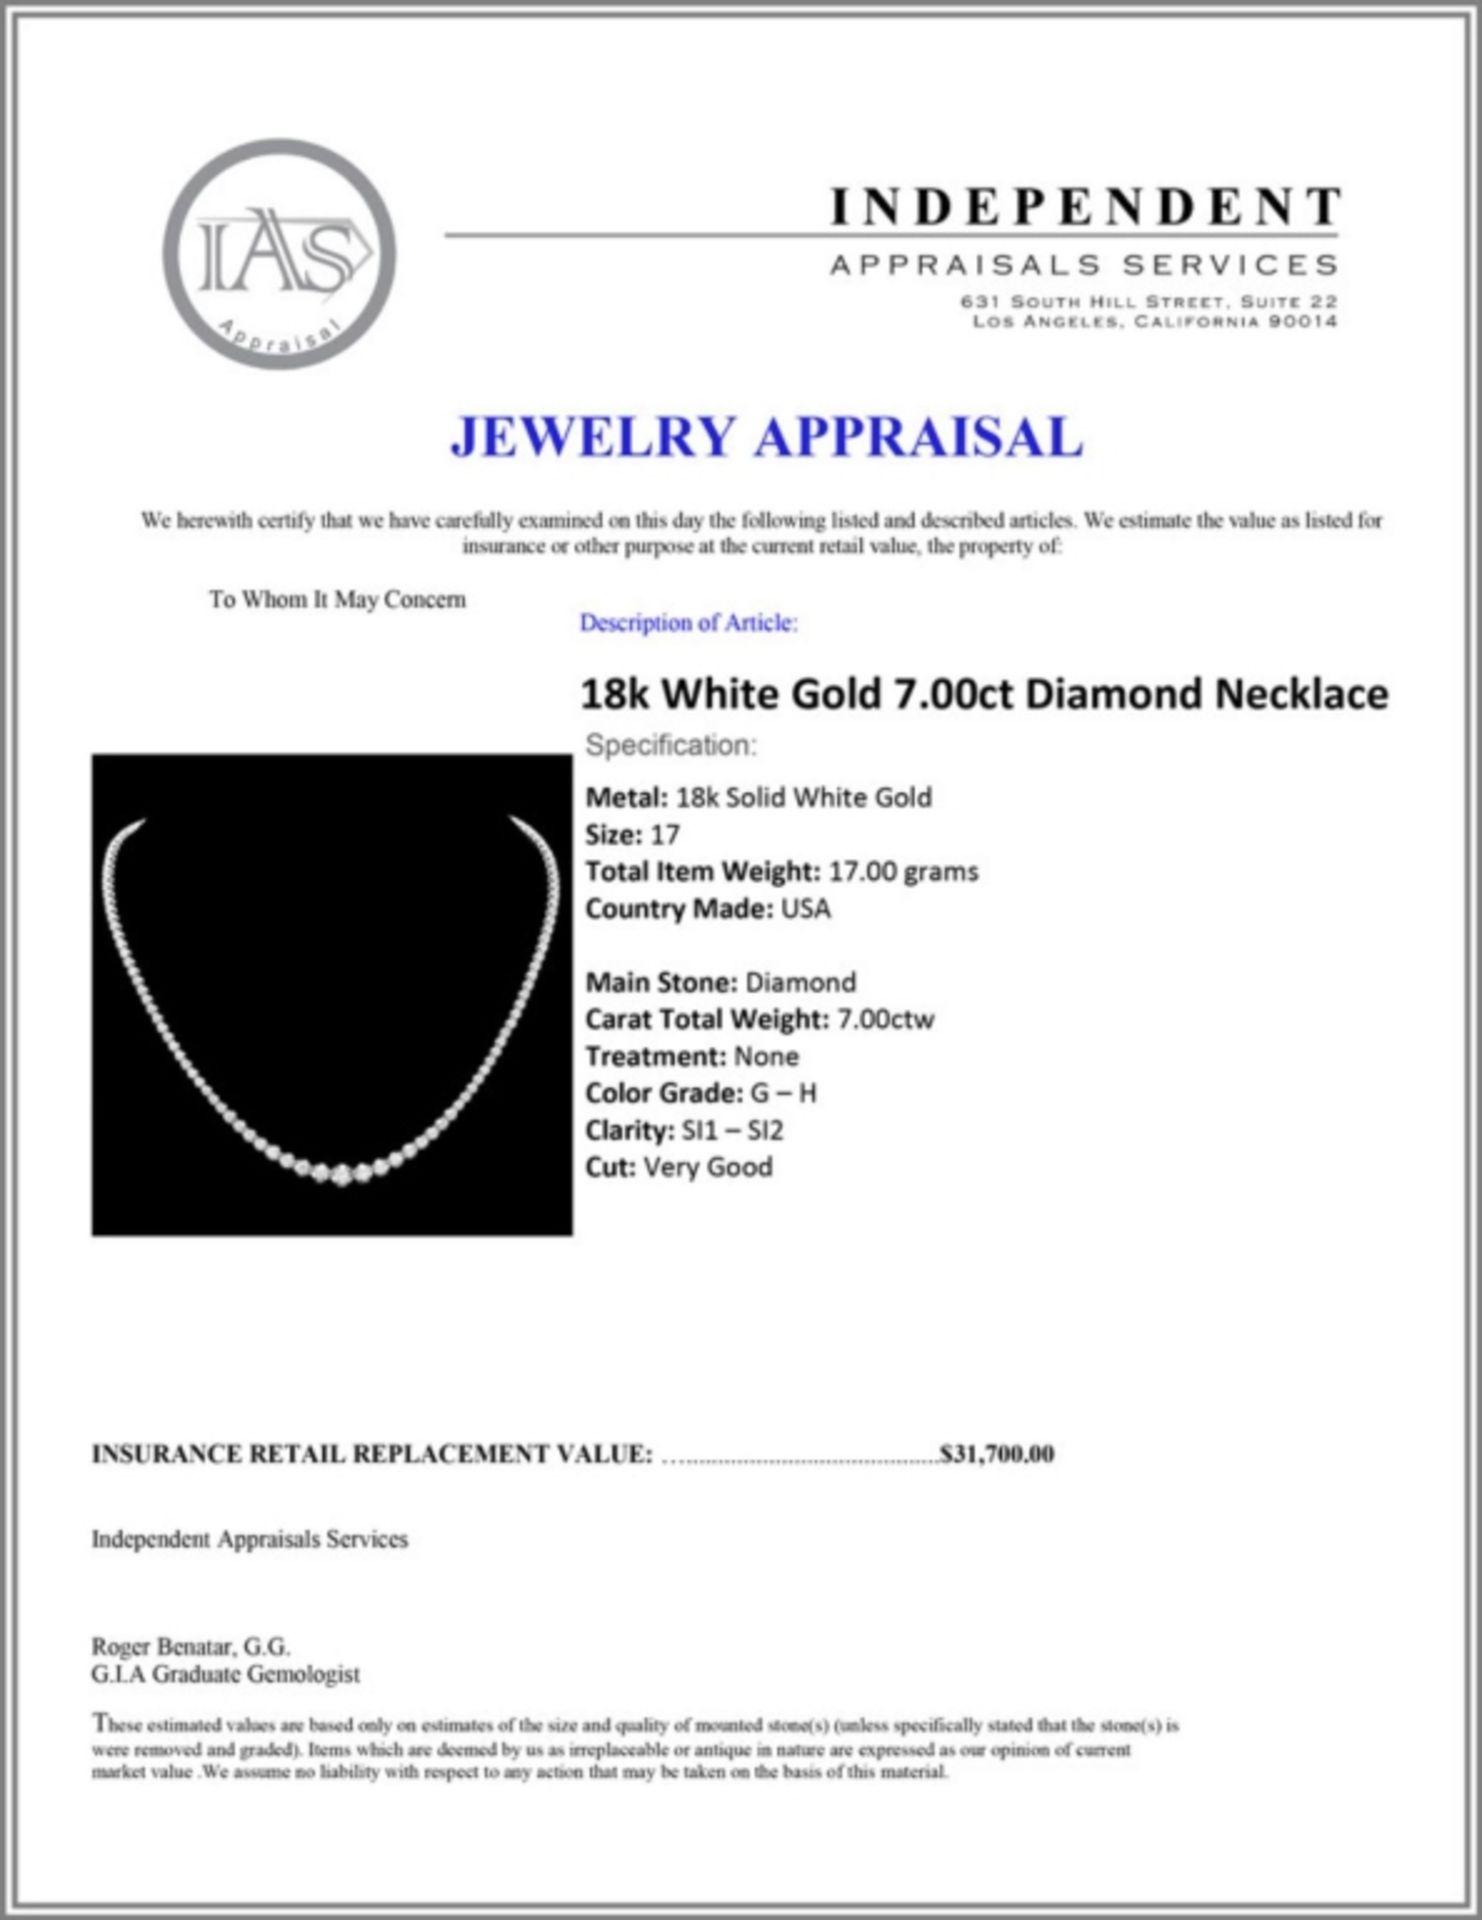 ^18k White Gold 7.00ct Diamond Necklace - Image 3 of 3